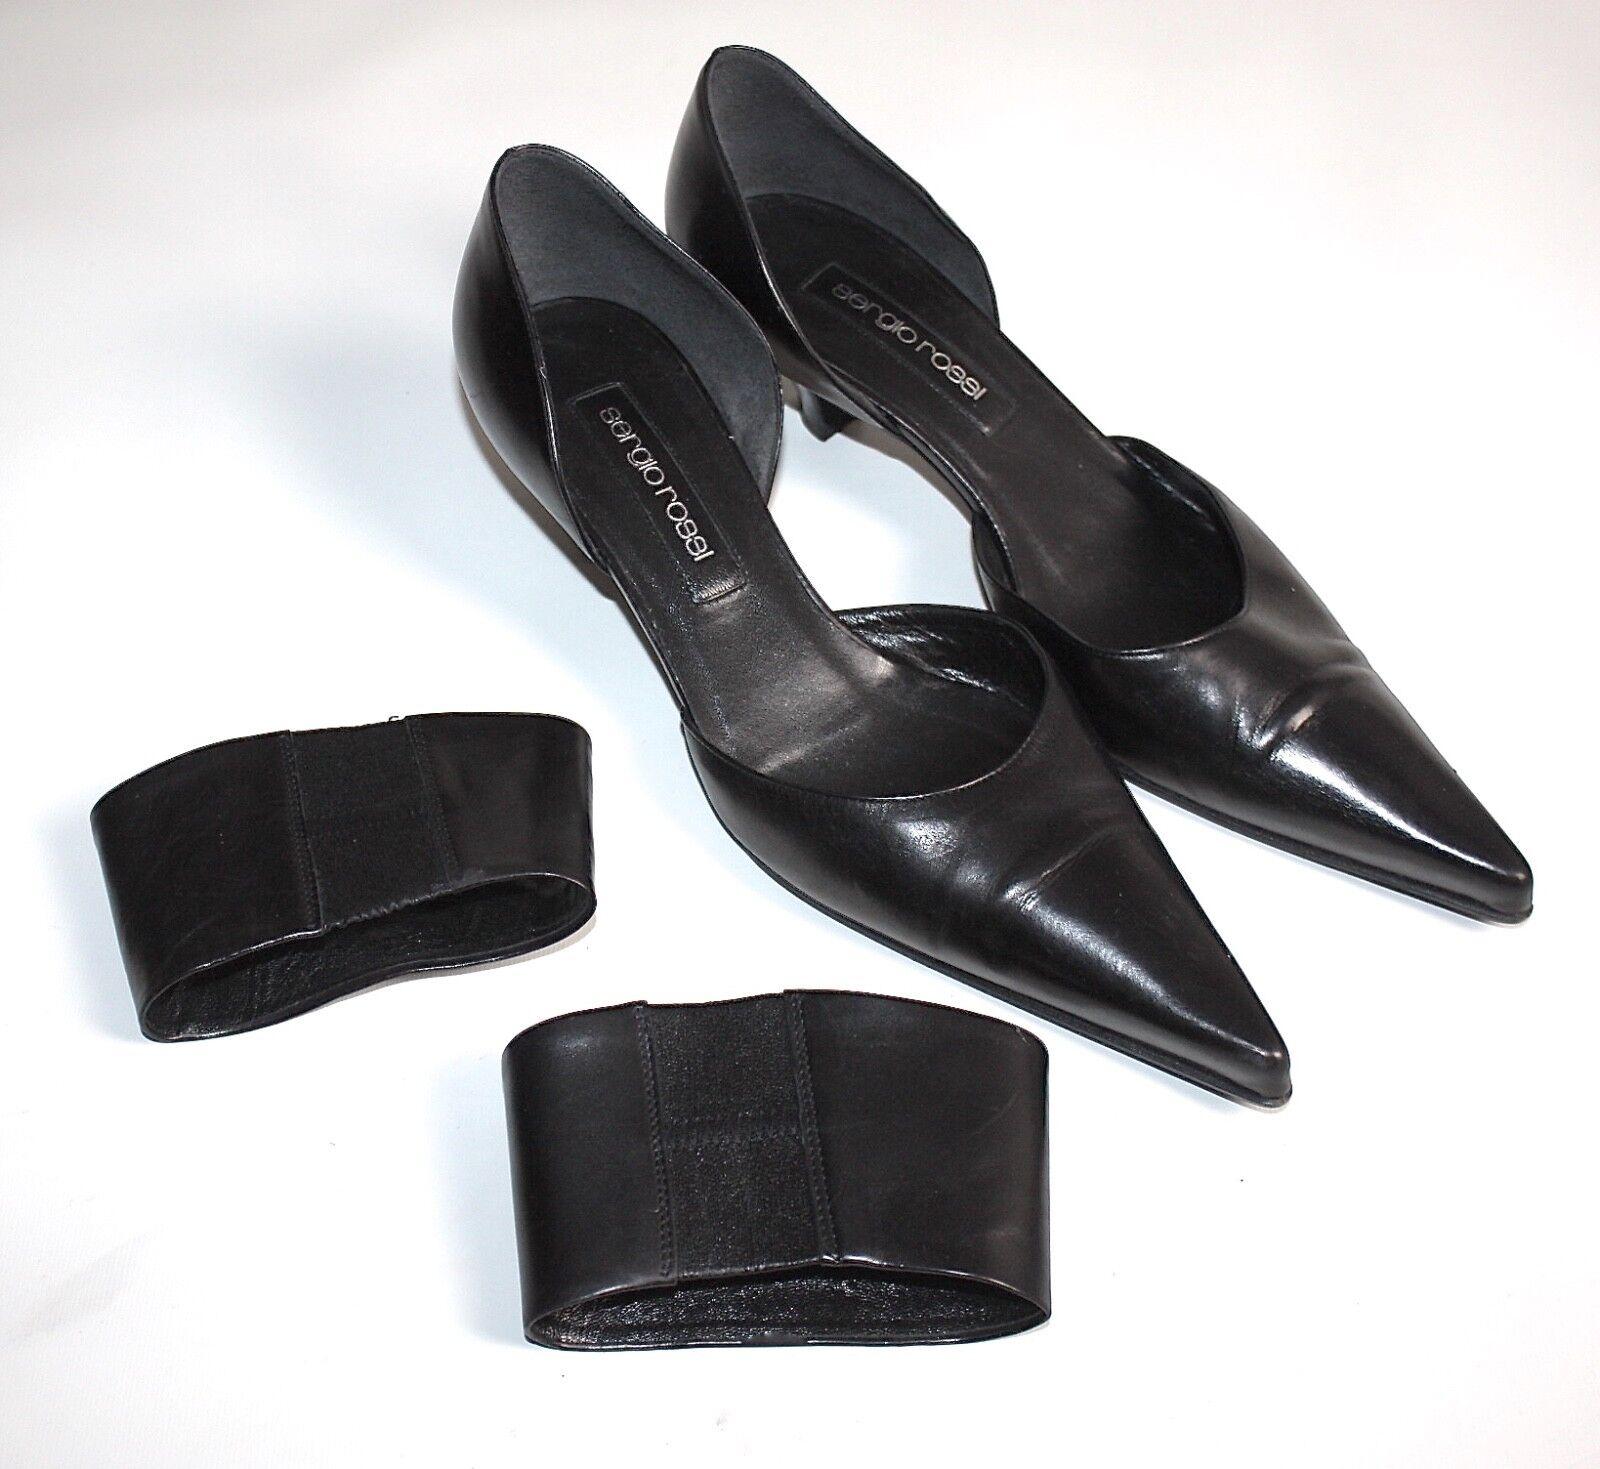 Sergio Rossi  Chaussures Femmes Escarpins Manchettes Business 38,5 Noir  4526